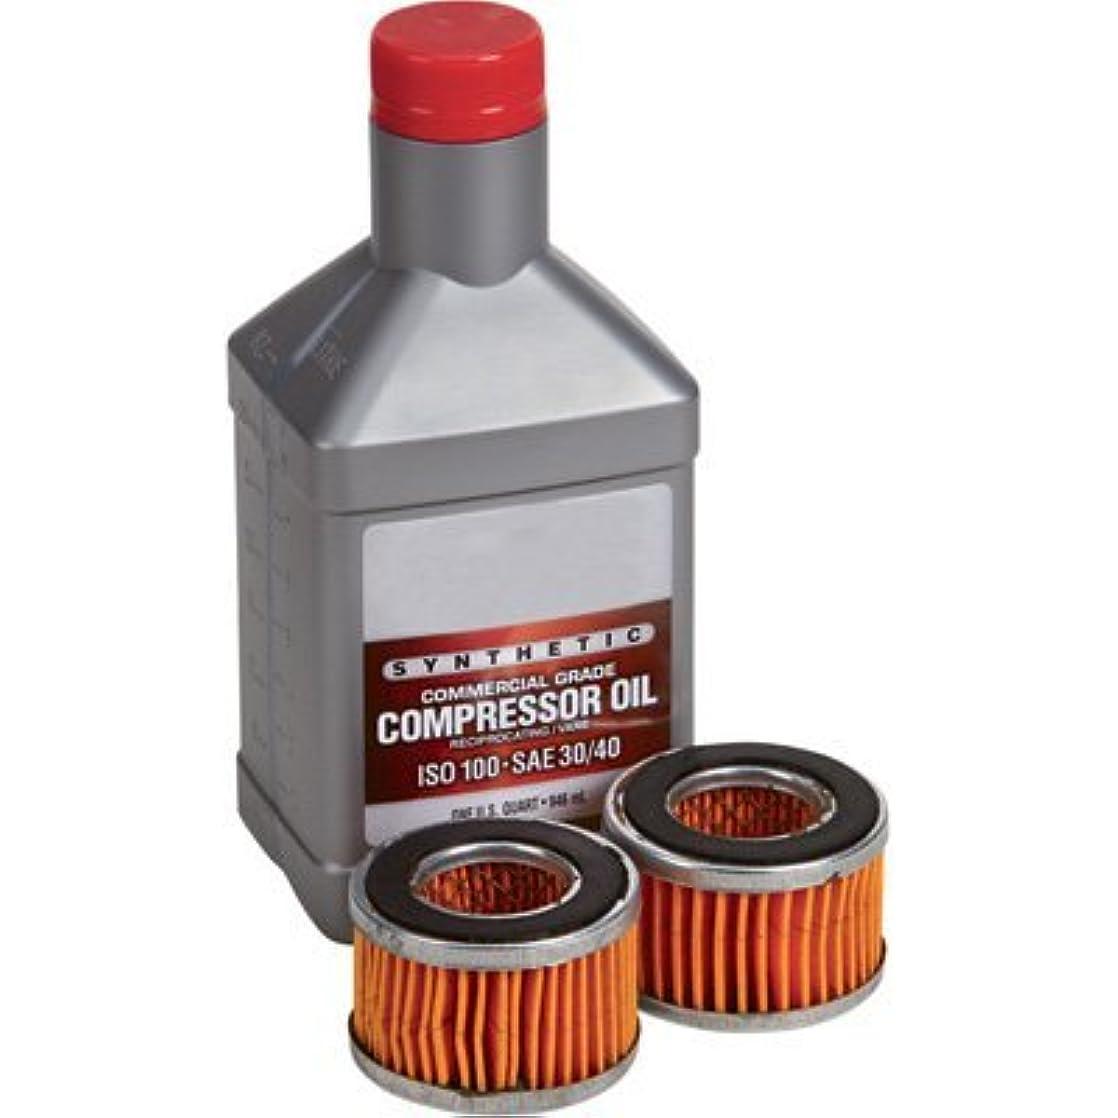 - NorthStar Air Compressor Start-Up Kit - Fits Item#s 459212, 459222, 459392, 459232, 25653, 25654 ahbjfsse50068